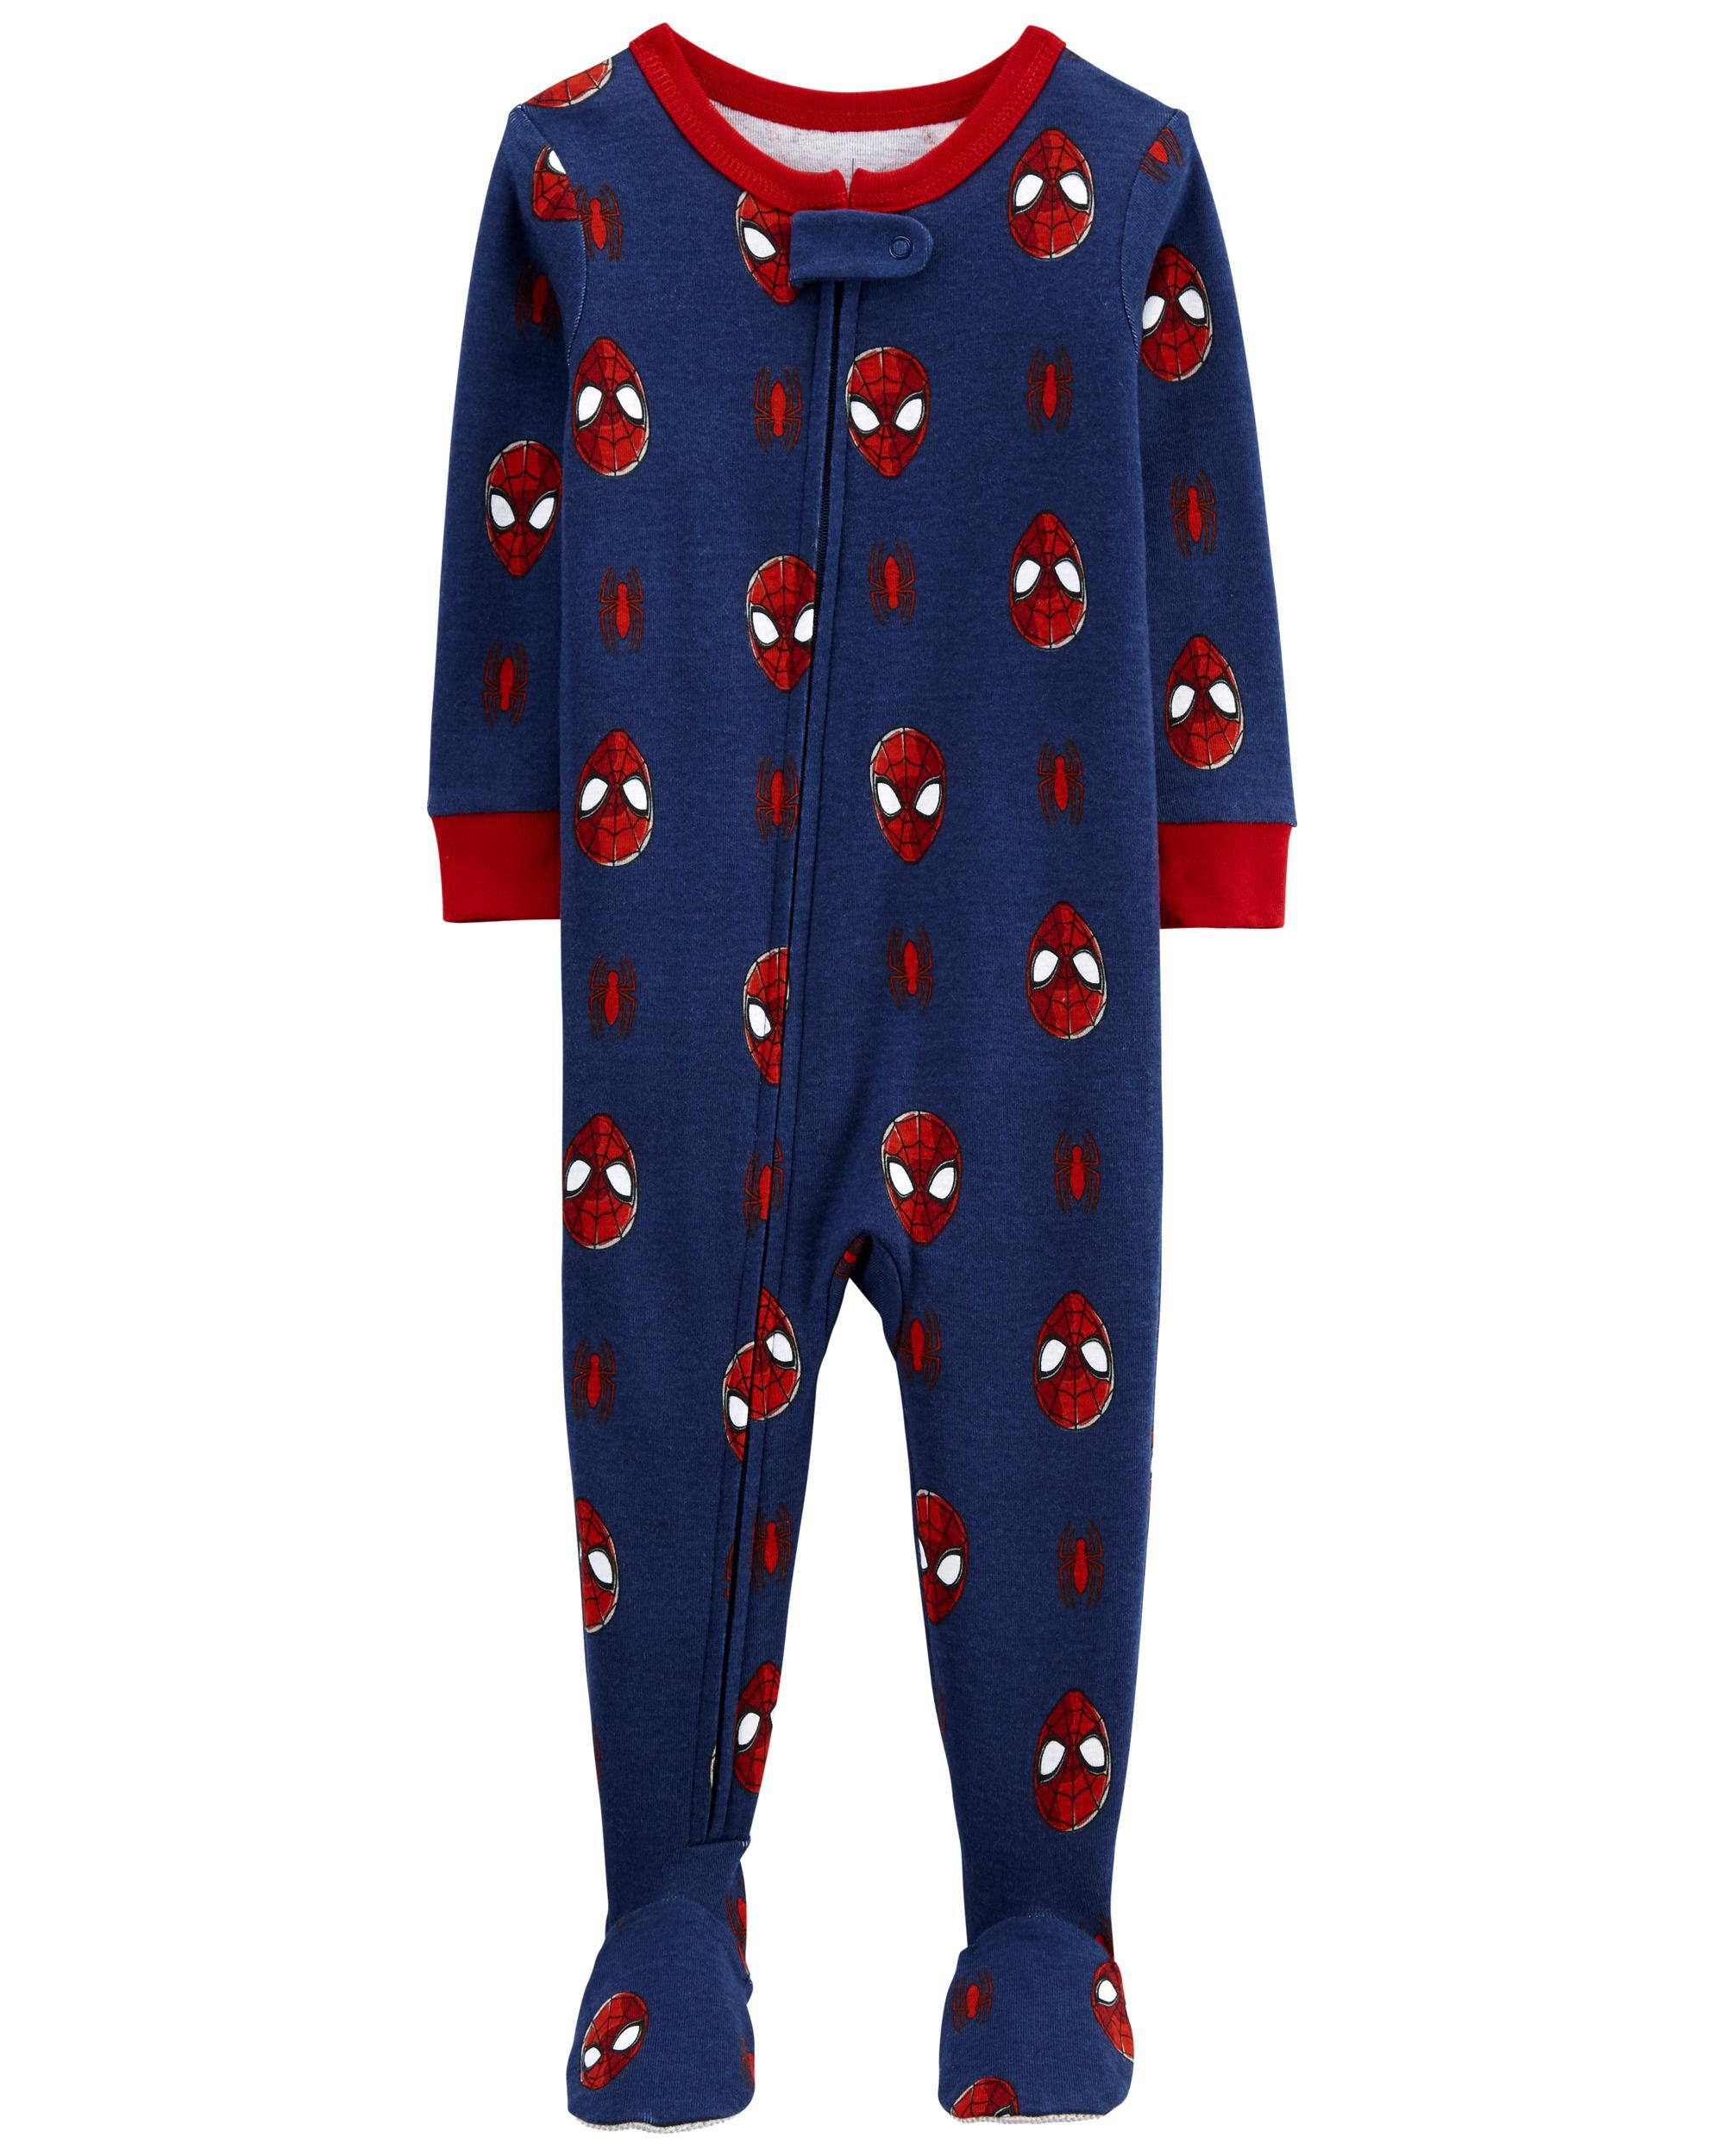 Carters 1-Piece Spider-Man 100% Snug Fit Cotton Footie PJs